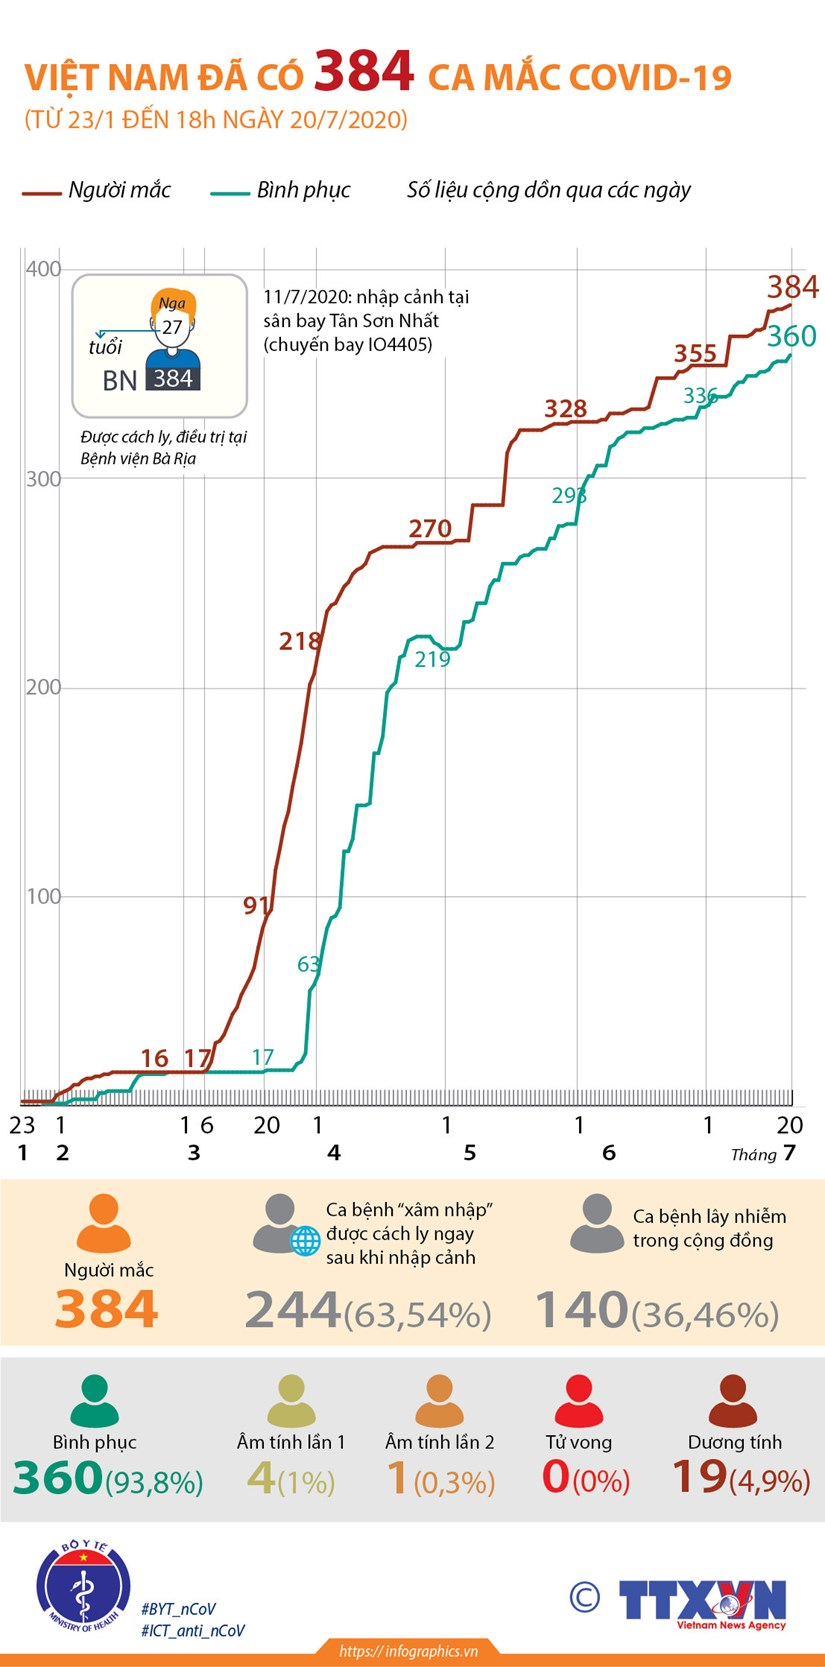 [Infographics] Viet Nam da ghi nhan 384 ca mac COVID-19 hinh anh 1